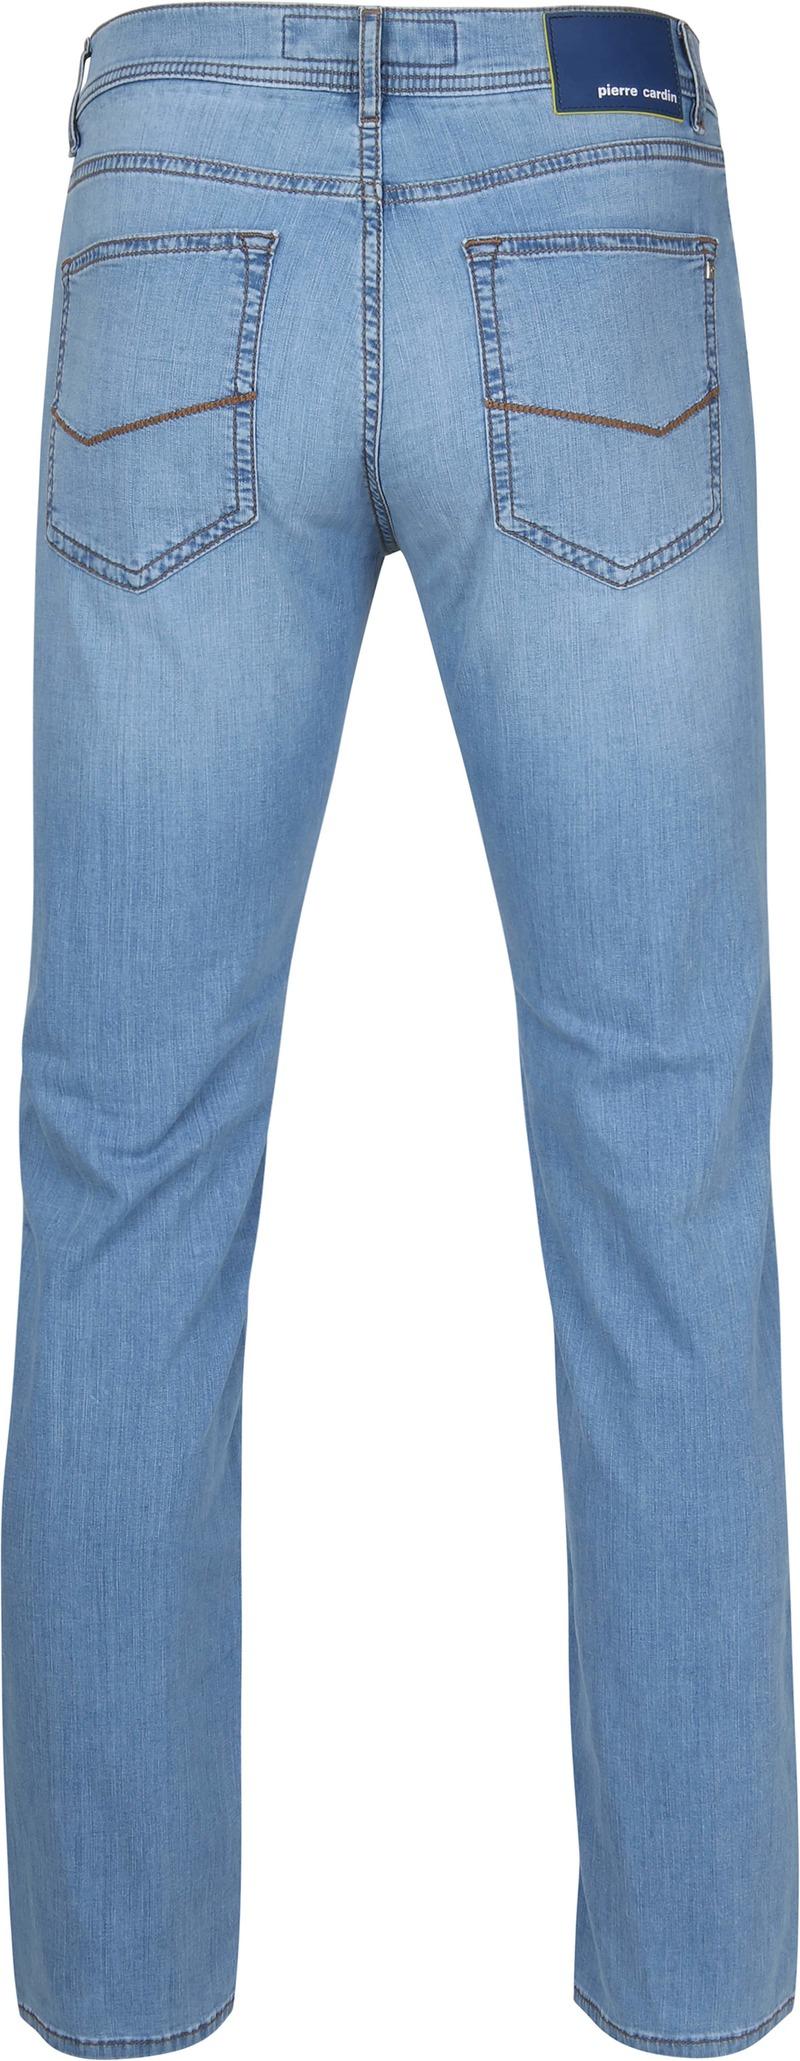 Pierre Cardin Jeans Lyon Airtouch Blue photo 3